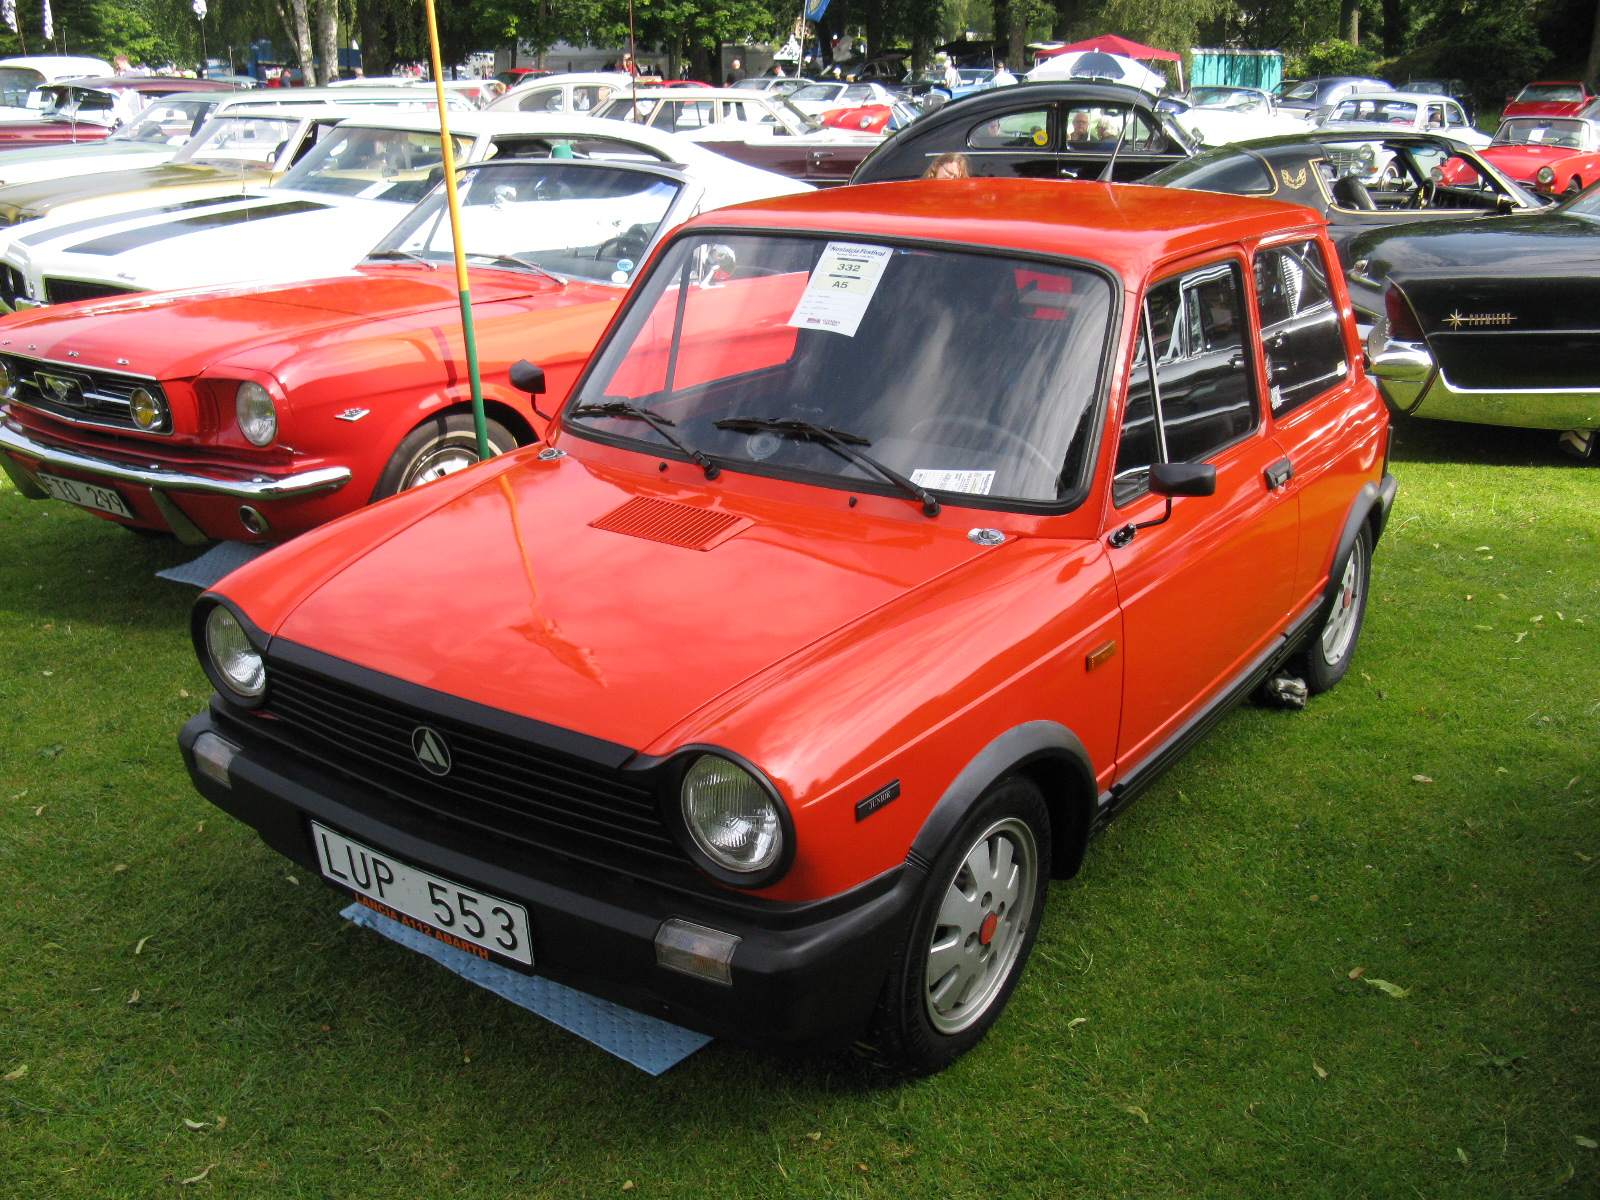 File:1984 Lancia A112 Junior (nakhon100).jpg - Wikimedia Commons